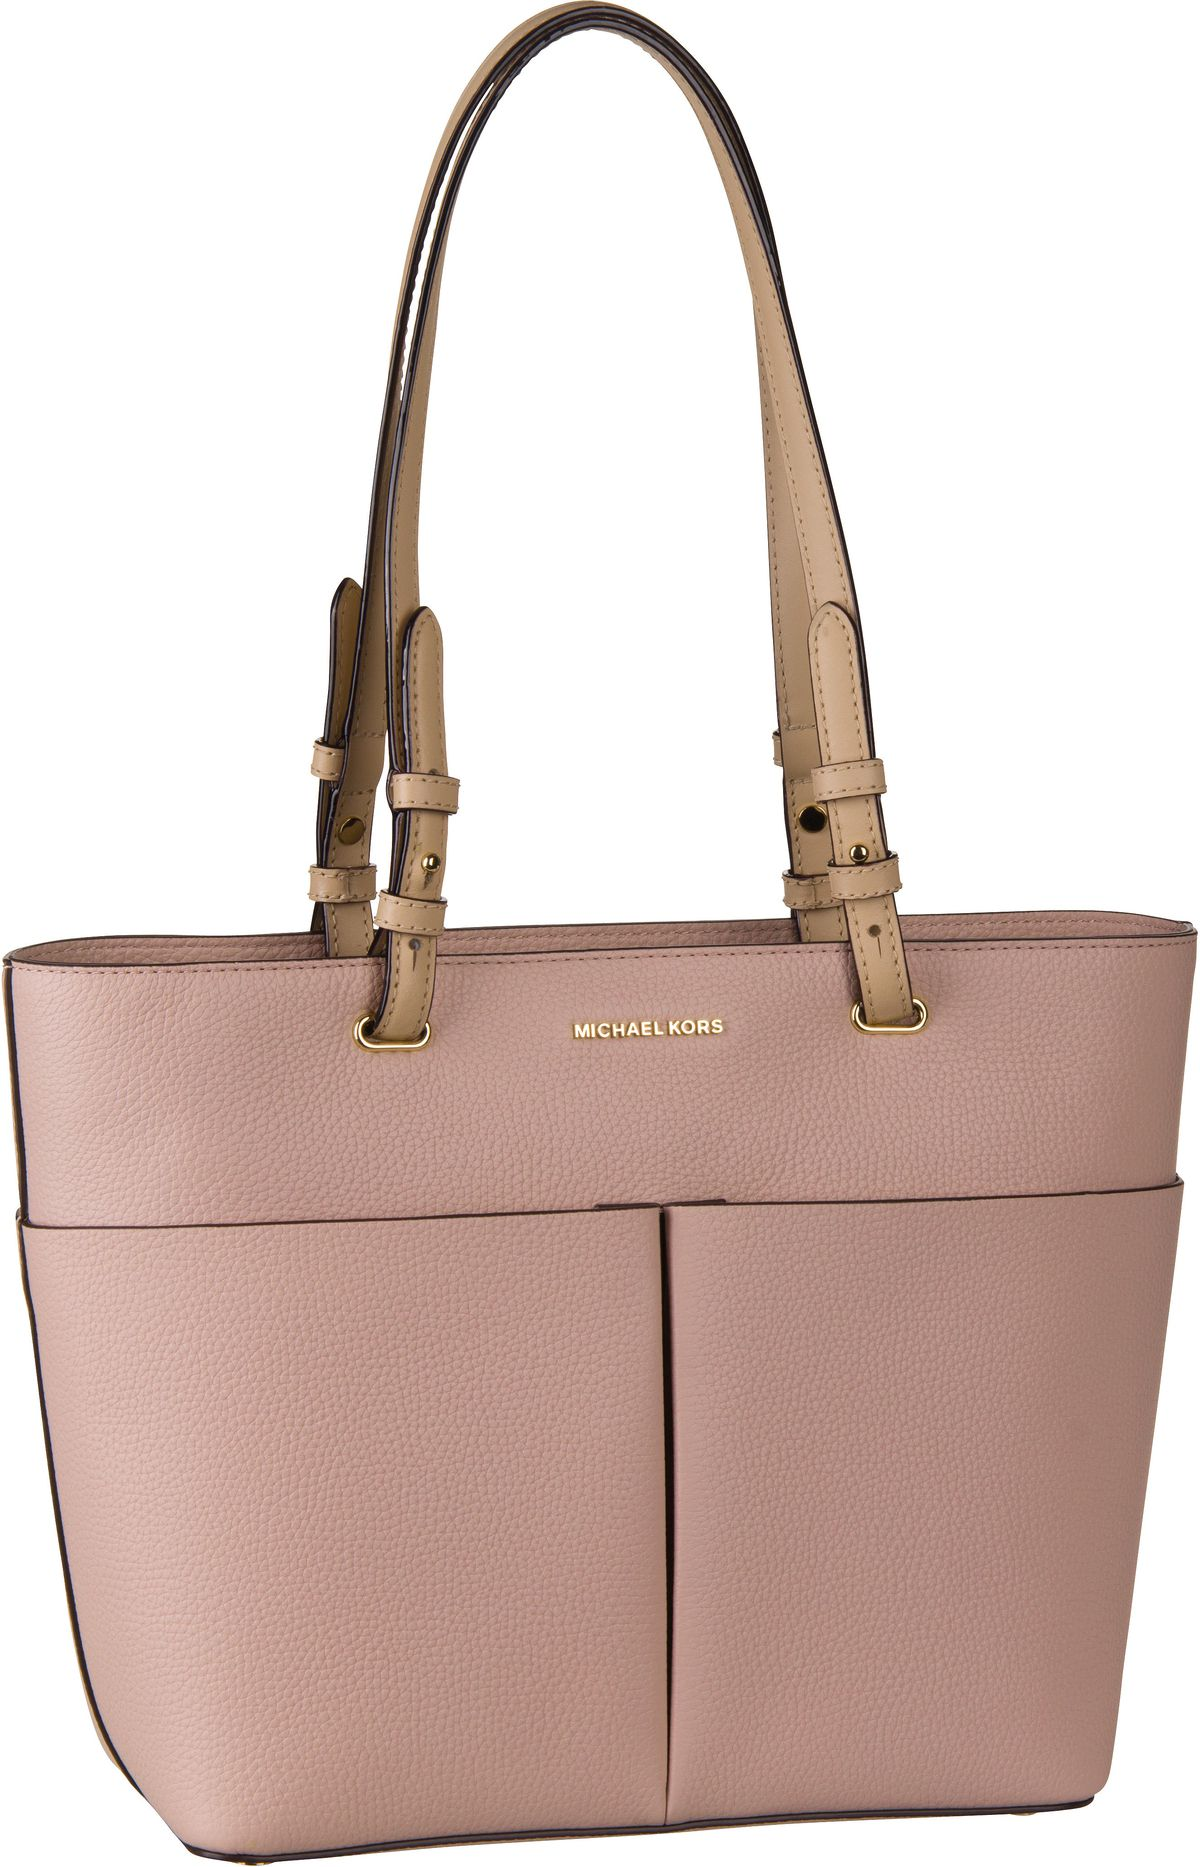 Michael Kors Handtasche Bedford Medium TZ Pocket Tote Soft Pink